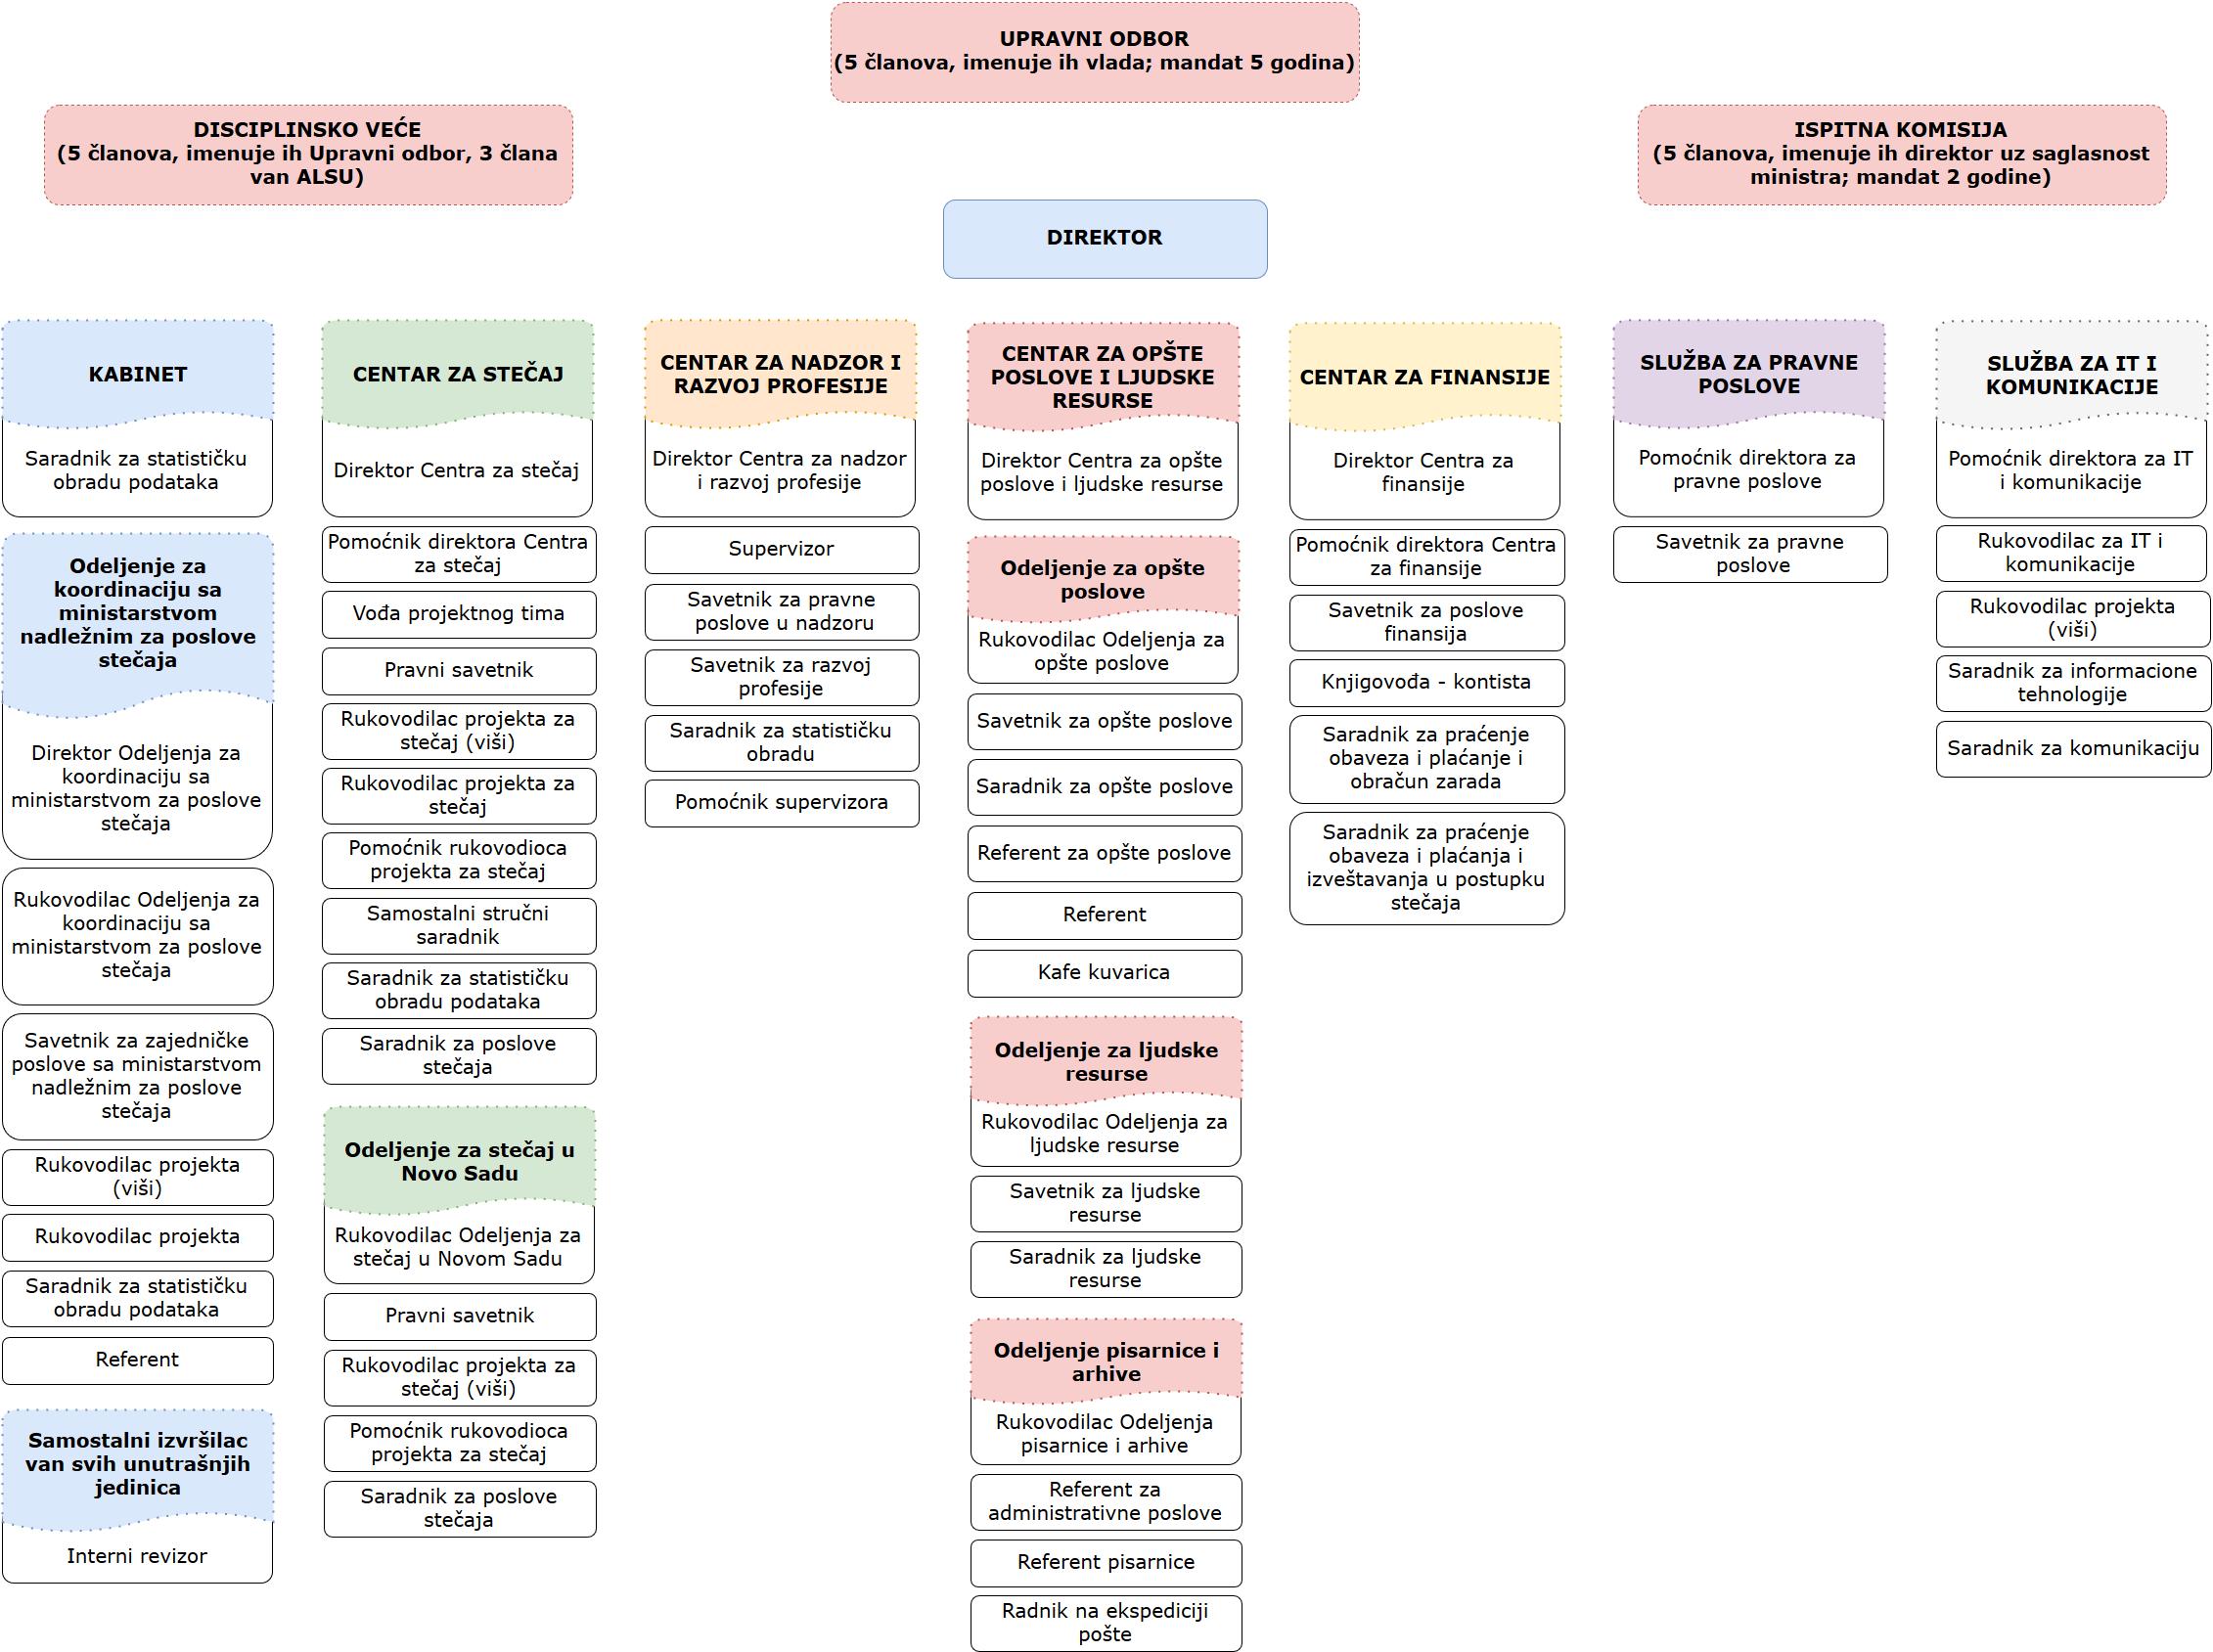 organizaciona struktura latinica 2016